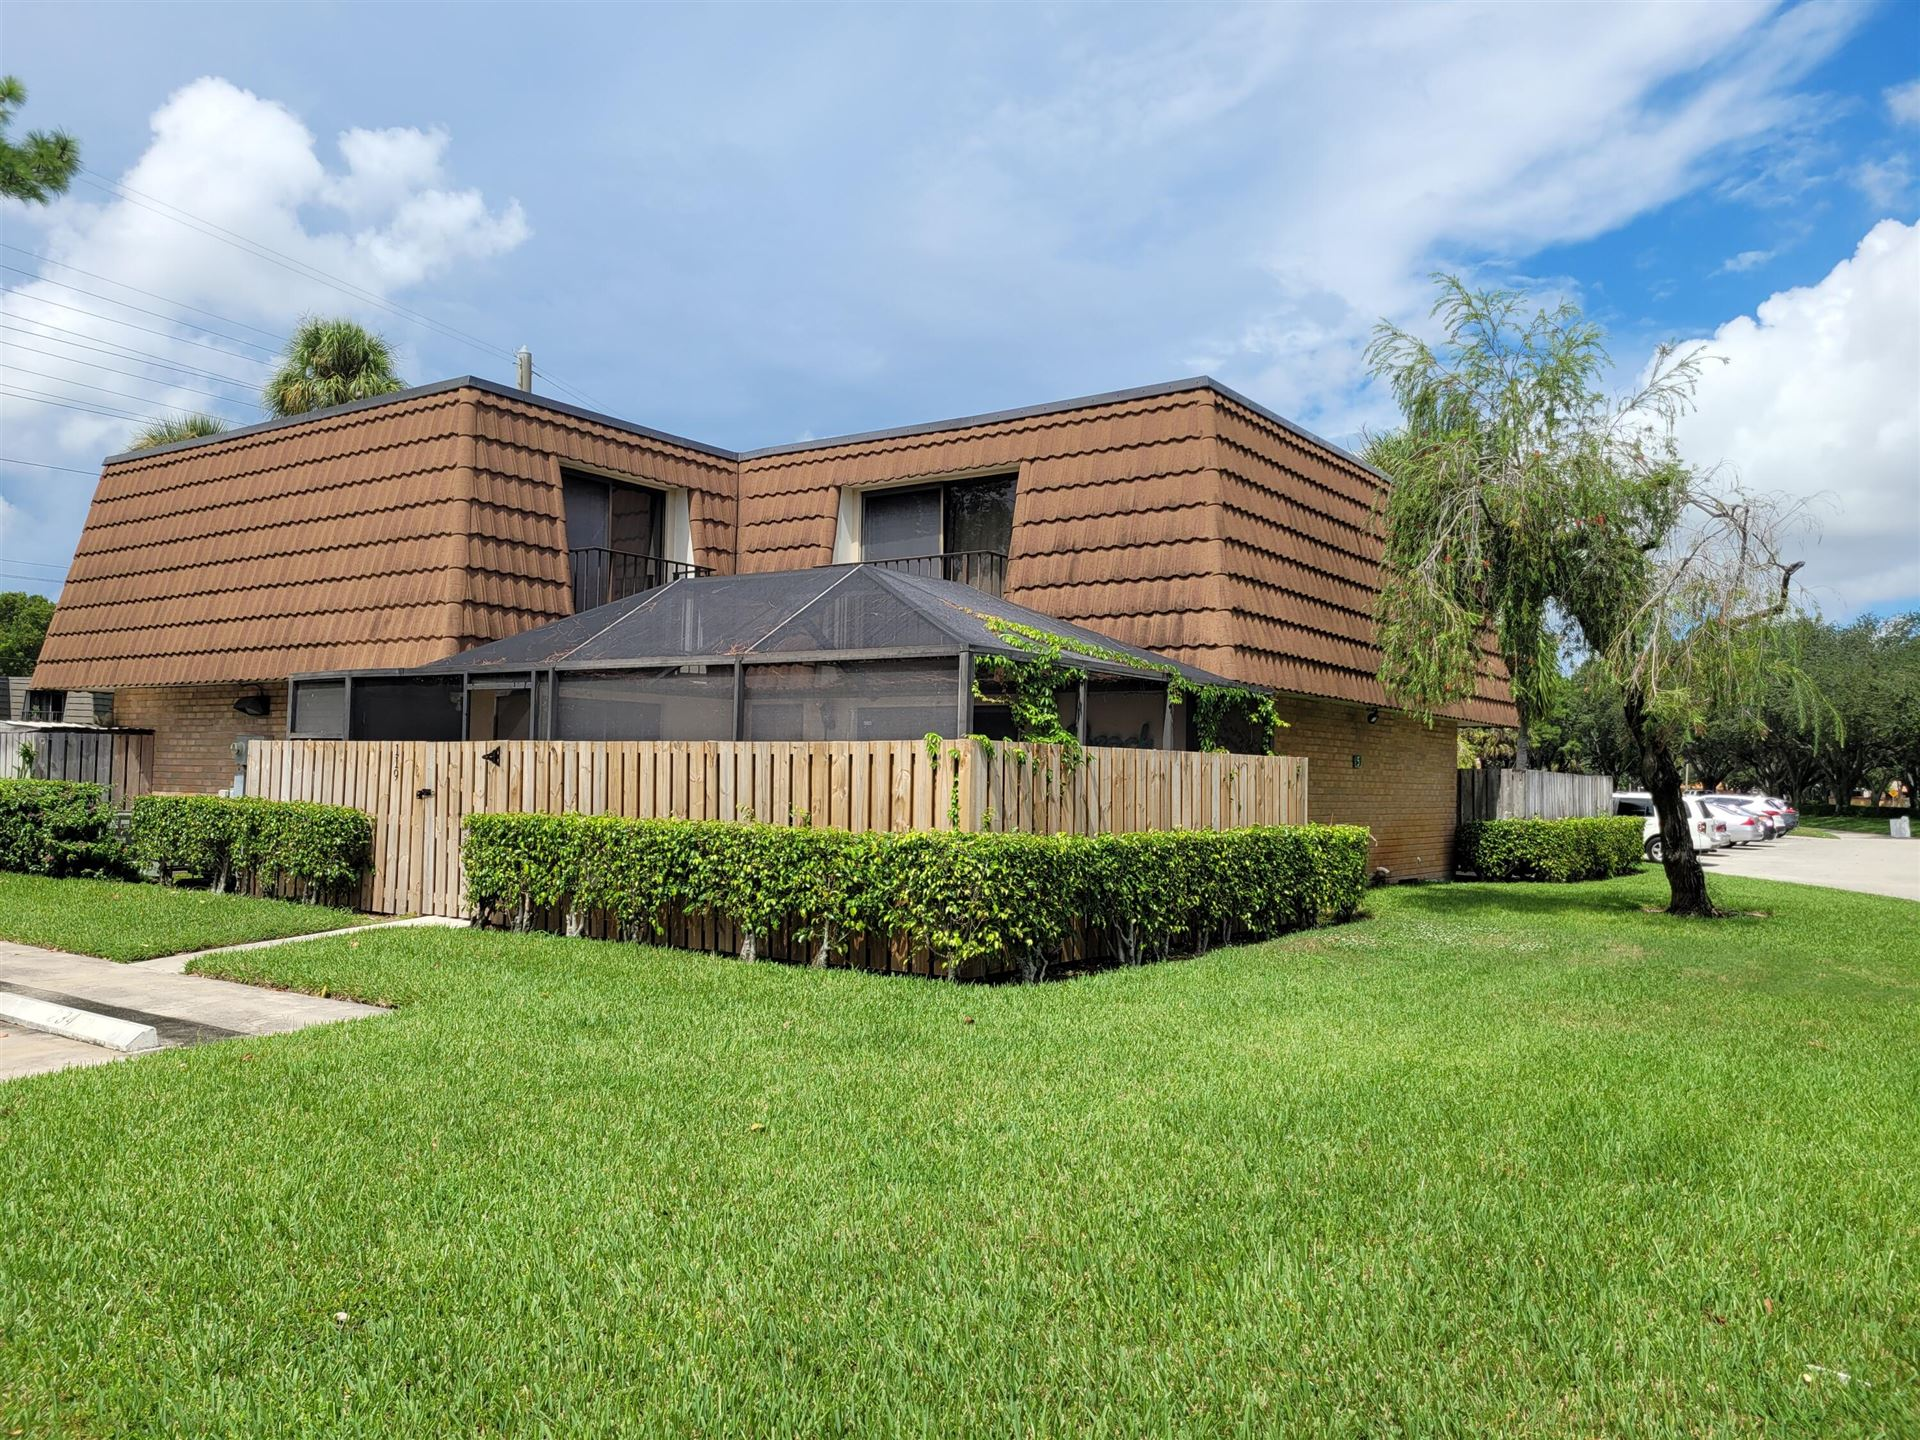 Photo of 119 Heritage Way, West Palm Beach, FL 33407 (MLS # RX-10747938)